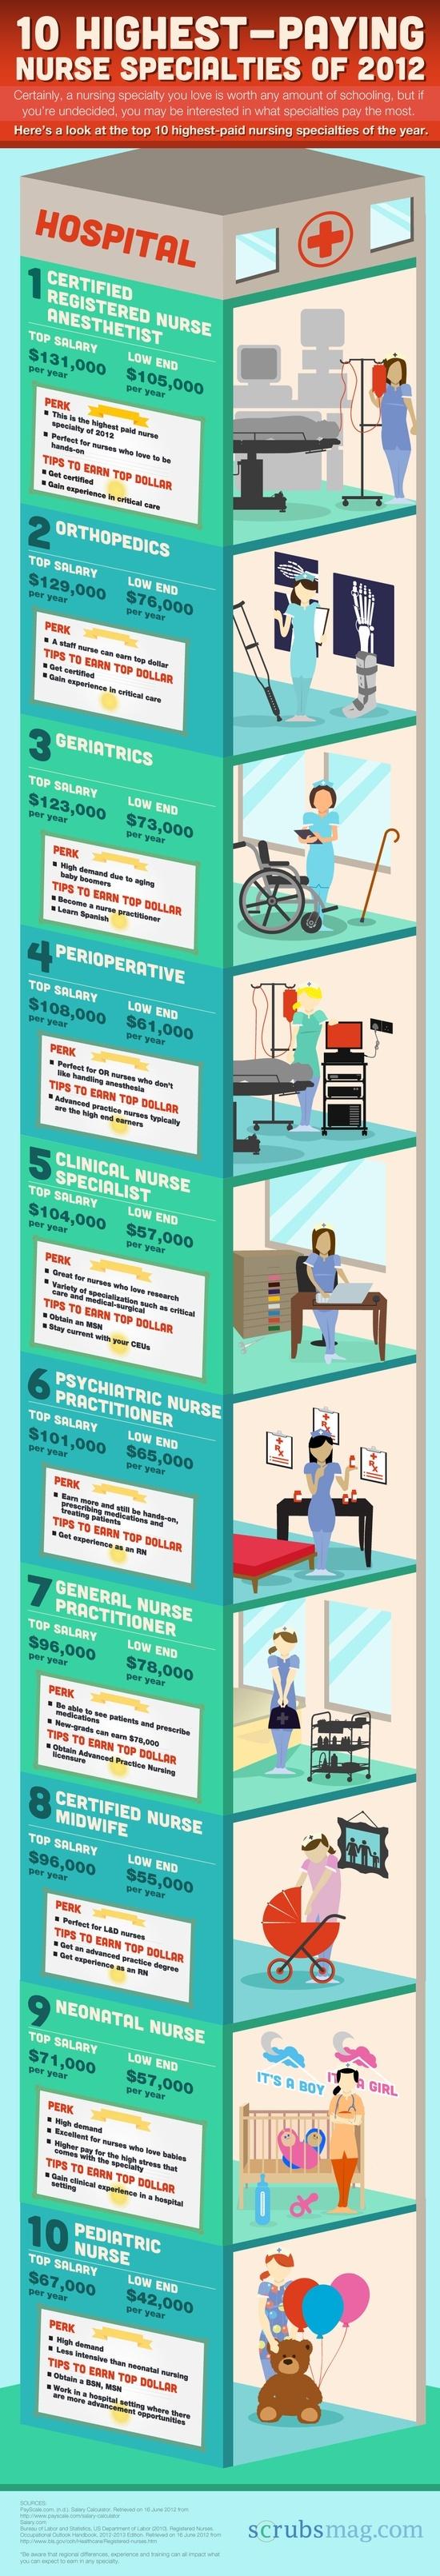 17 Best images about School nurse stuff on Pinterest   Assessment, Nursing schools and Nursing ...